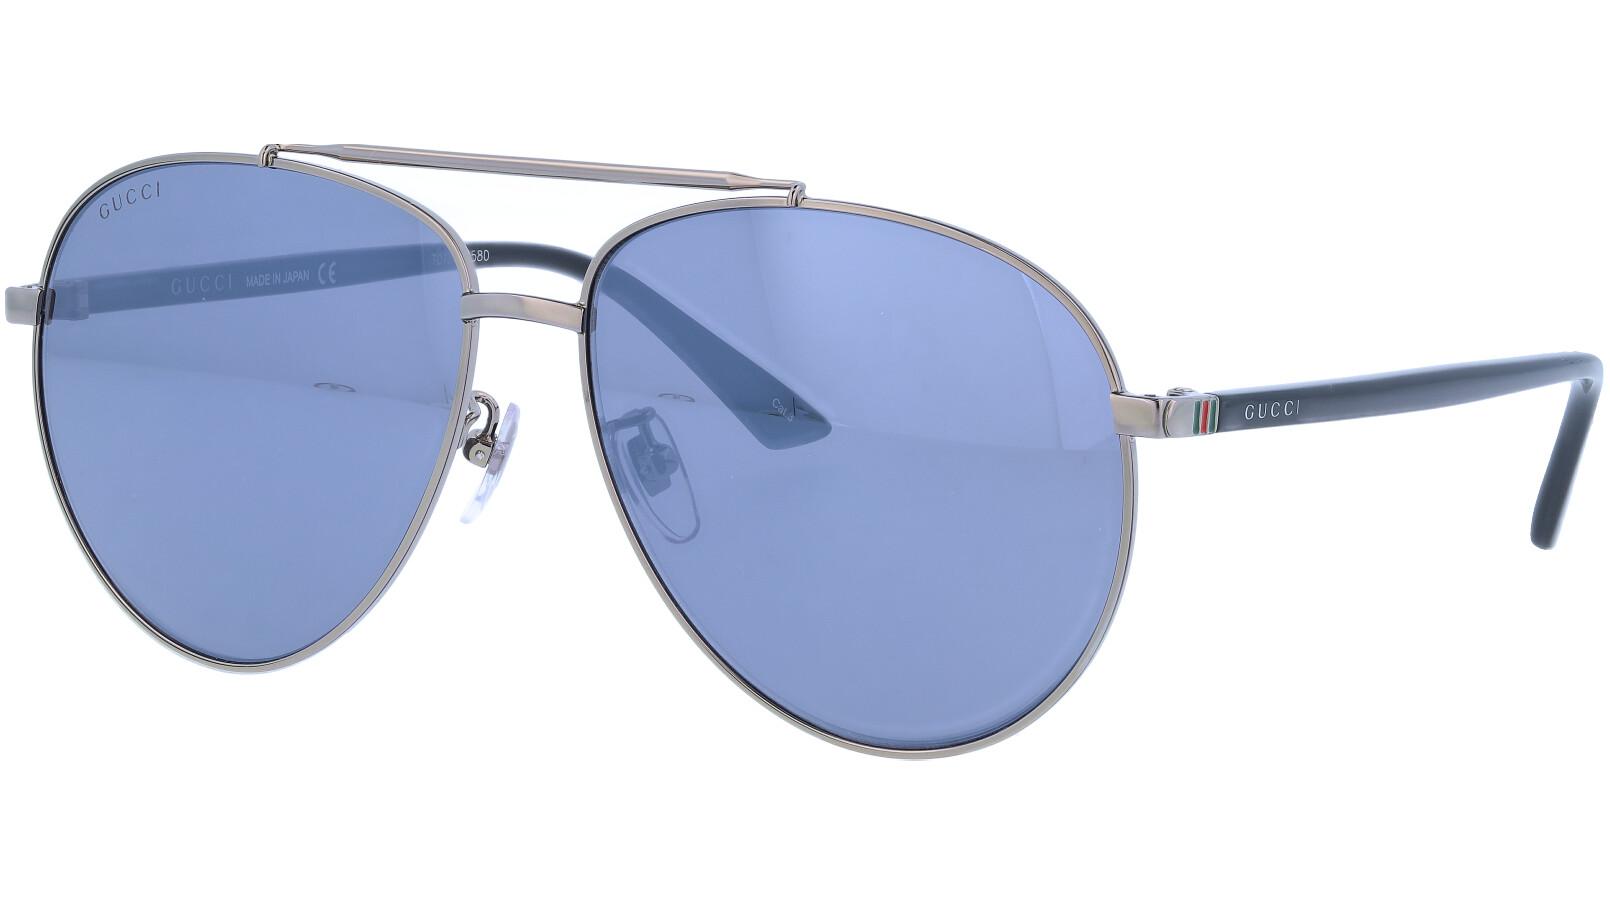 GUCCI GG0043SA 001 61 RUTHENIUM Sunglasses